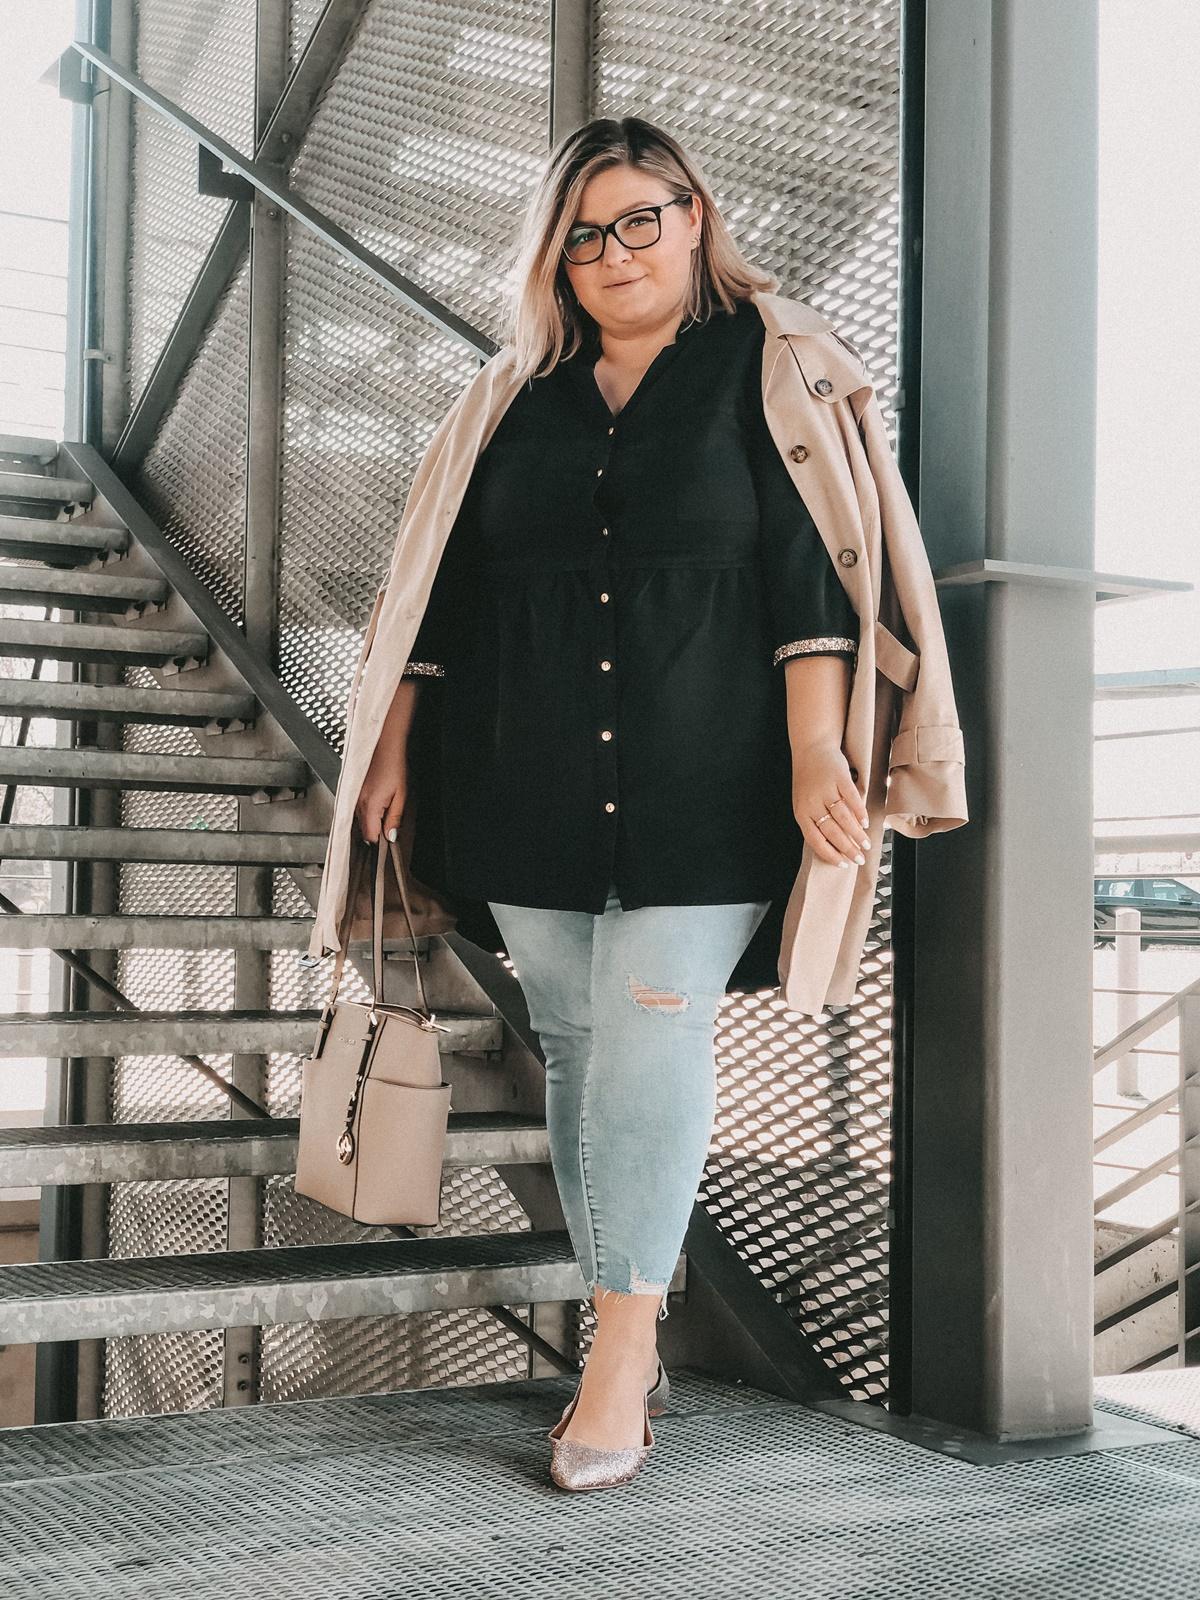 CITALEA Frühjahres Mode 2019 elabonbonella plus size fashion blog07